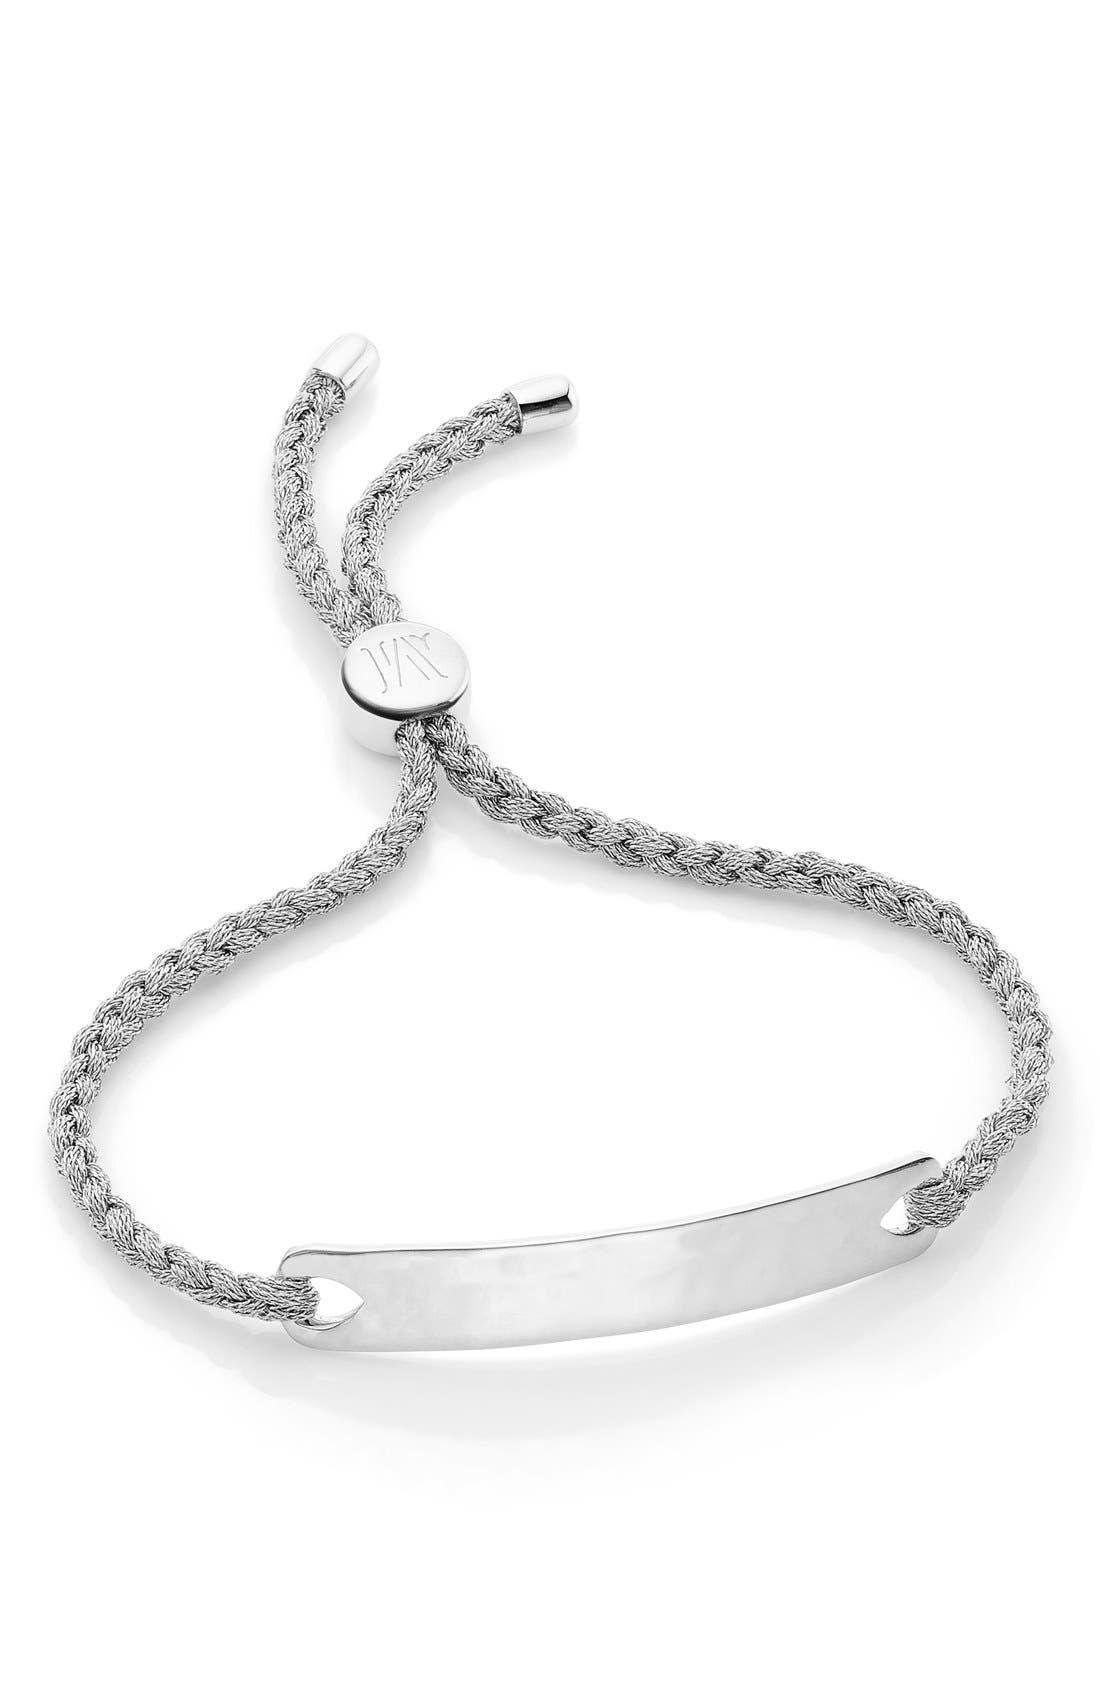 MONICA VINADER Engravable HavanaFriendship Bracelet, Main, color, SILVER/ SILVER